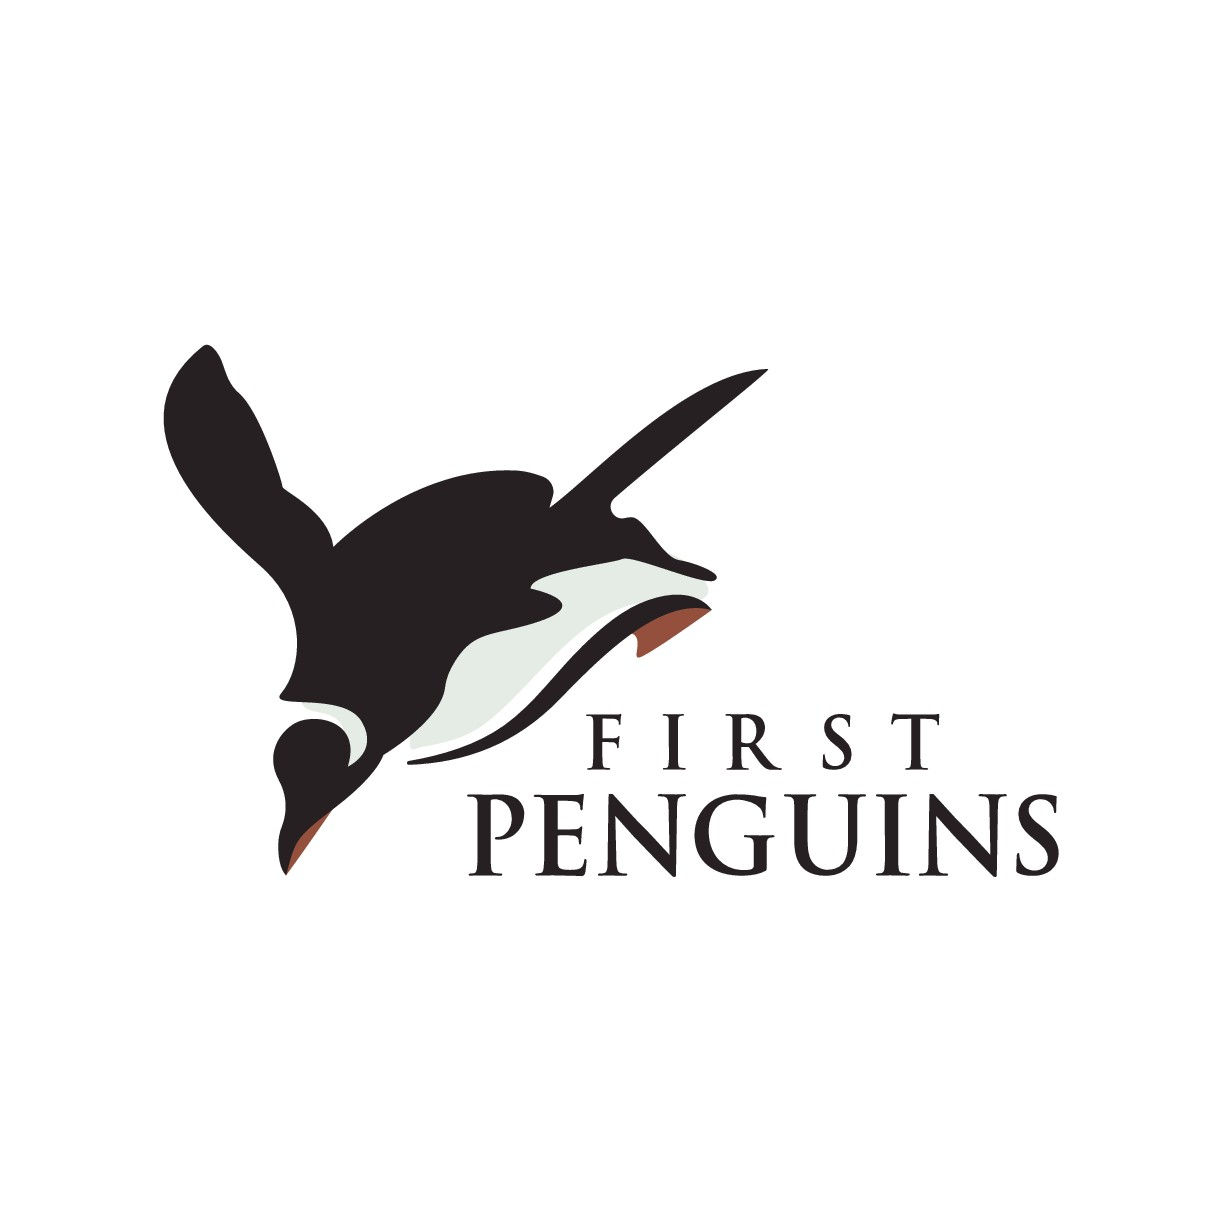 First Penguins